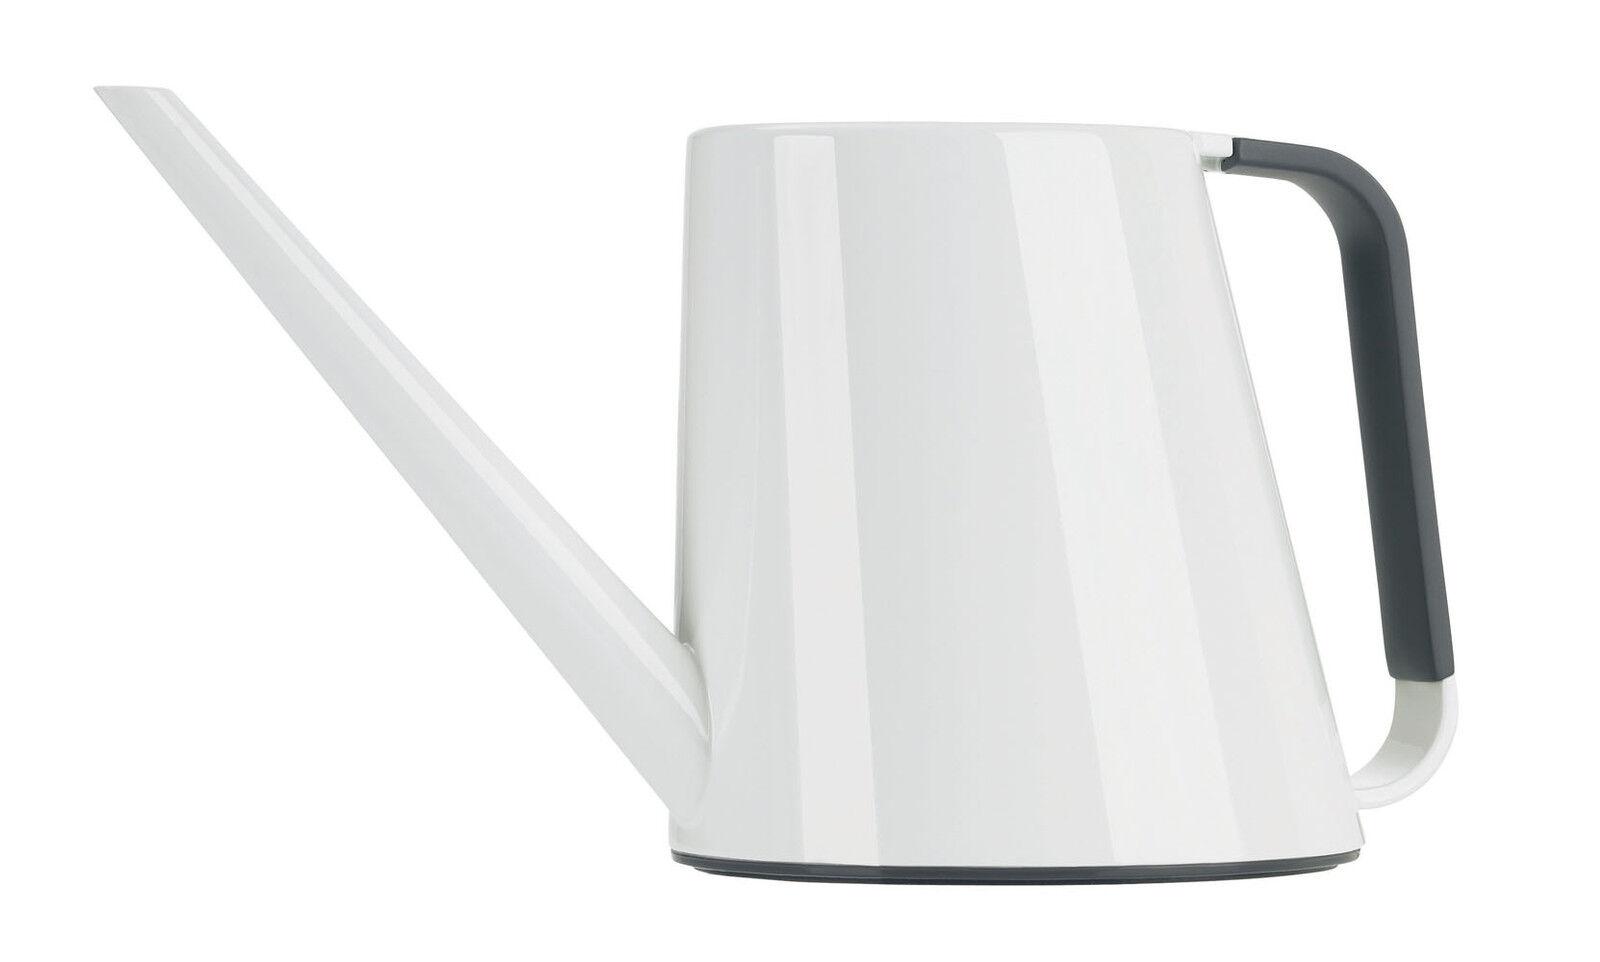 Emsa Loft Flowers Moulders Moulders Sprenger 1,8 L White Modern. Stylish. High Quality